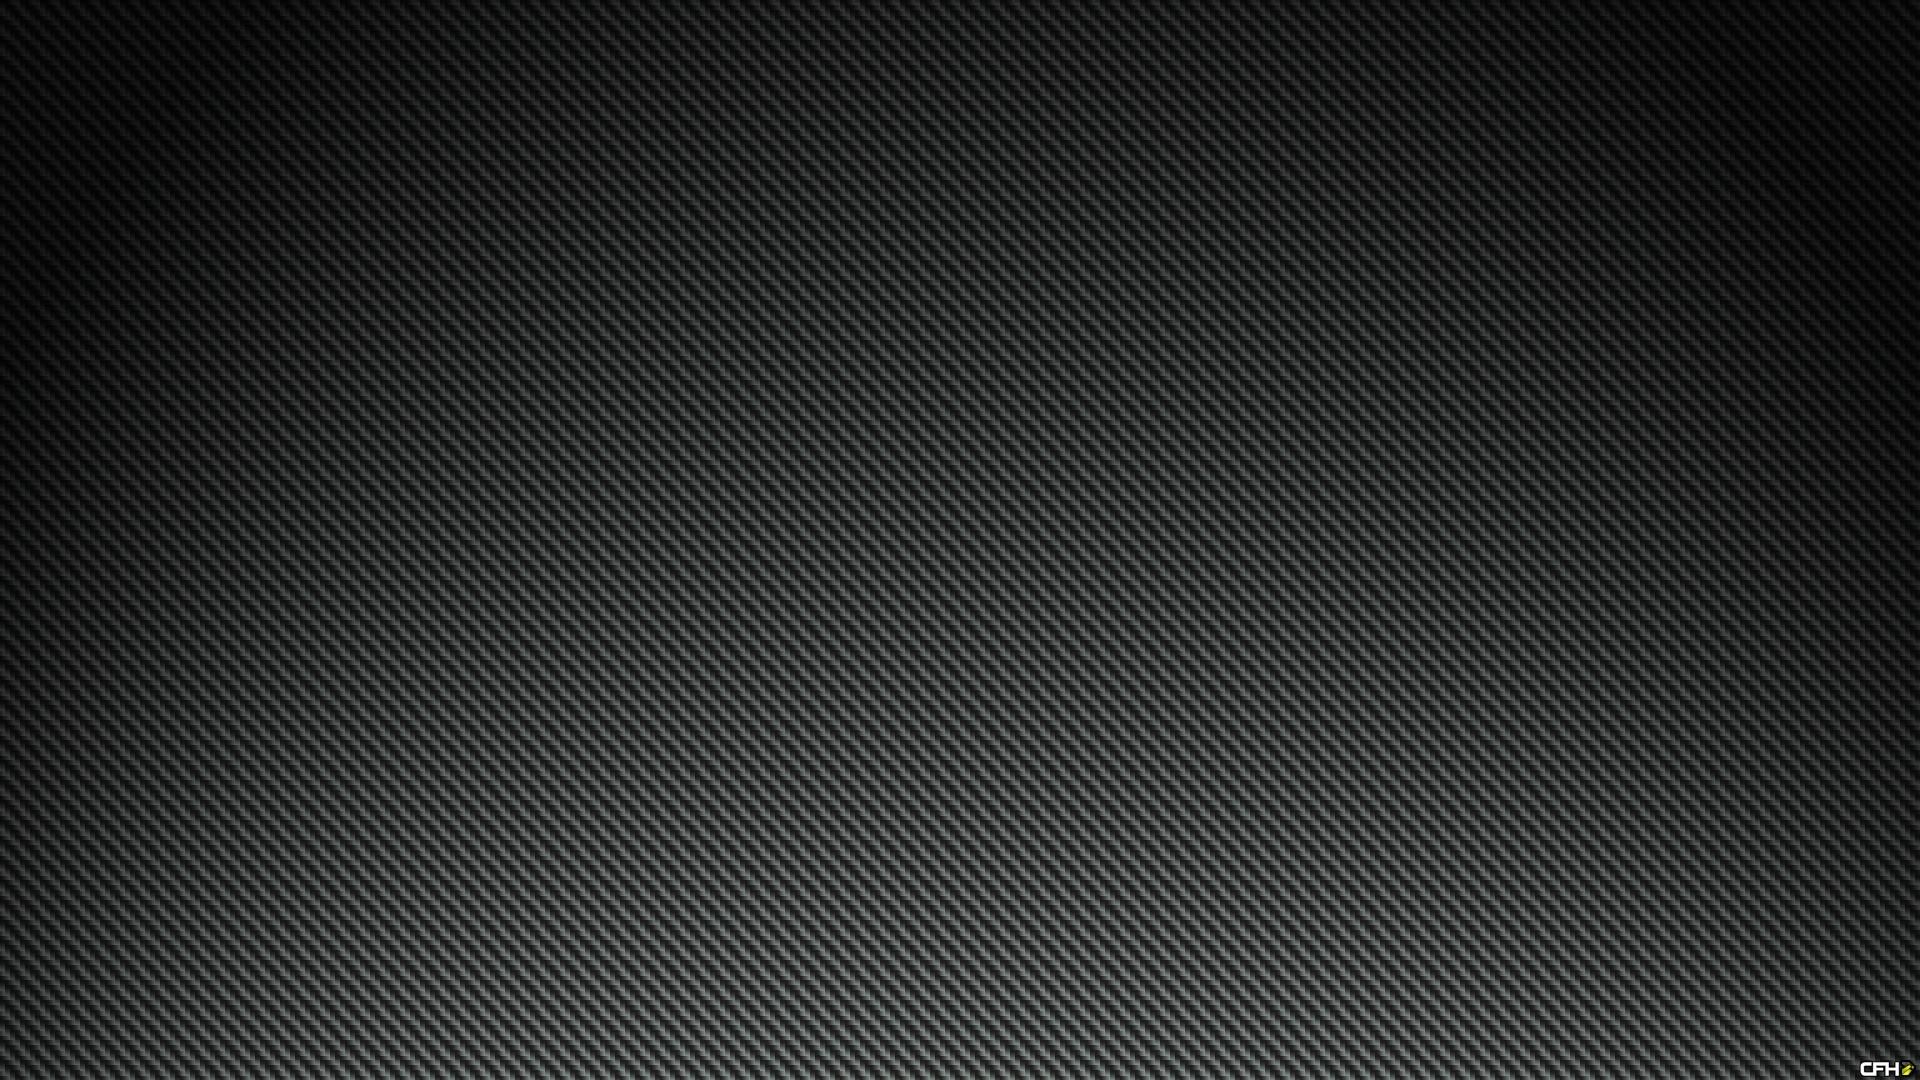 10 Latest Black Carbon Fiber Wallpaper Hd FULL HD 1080p ...